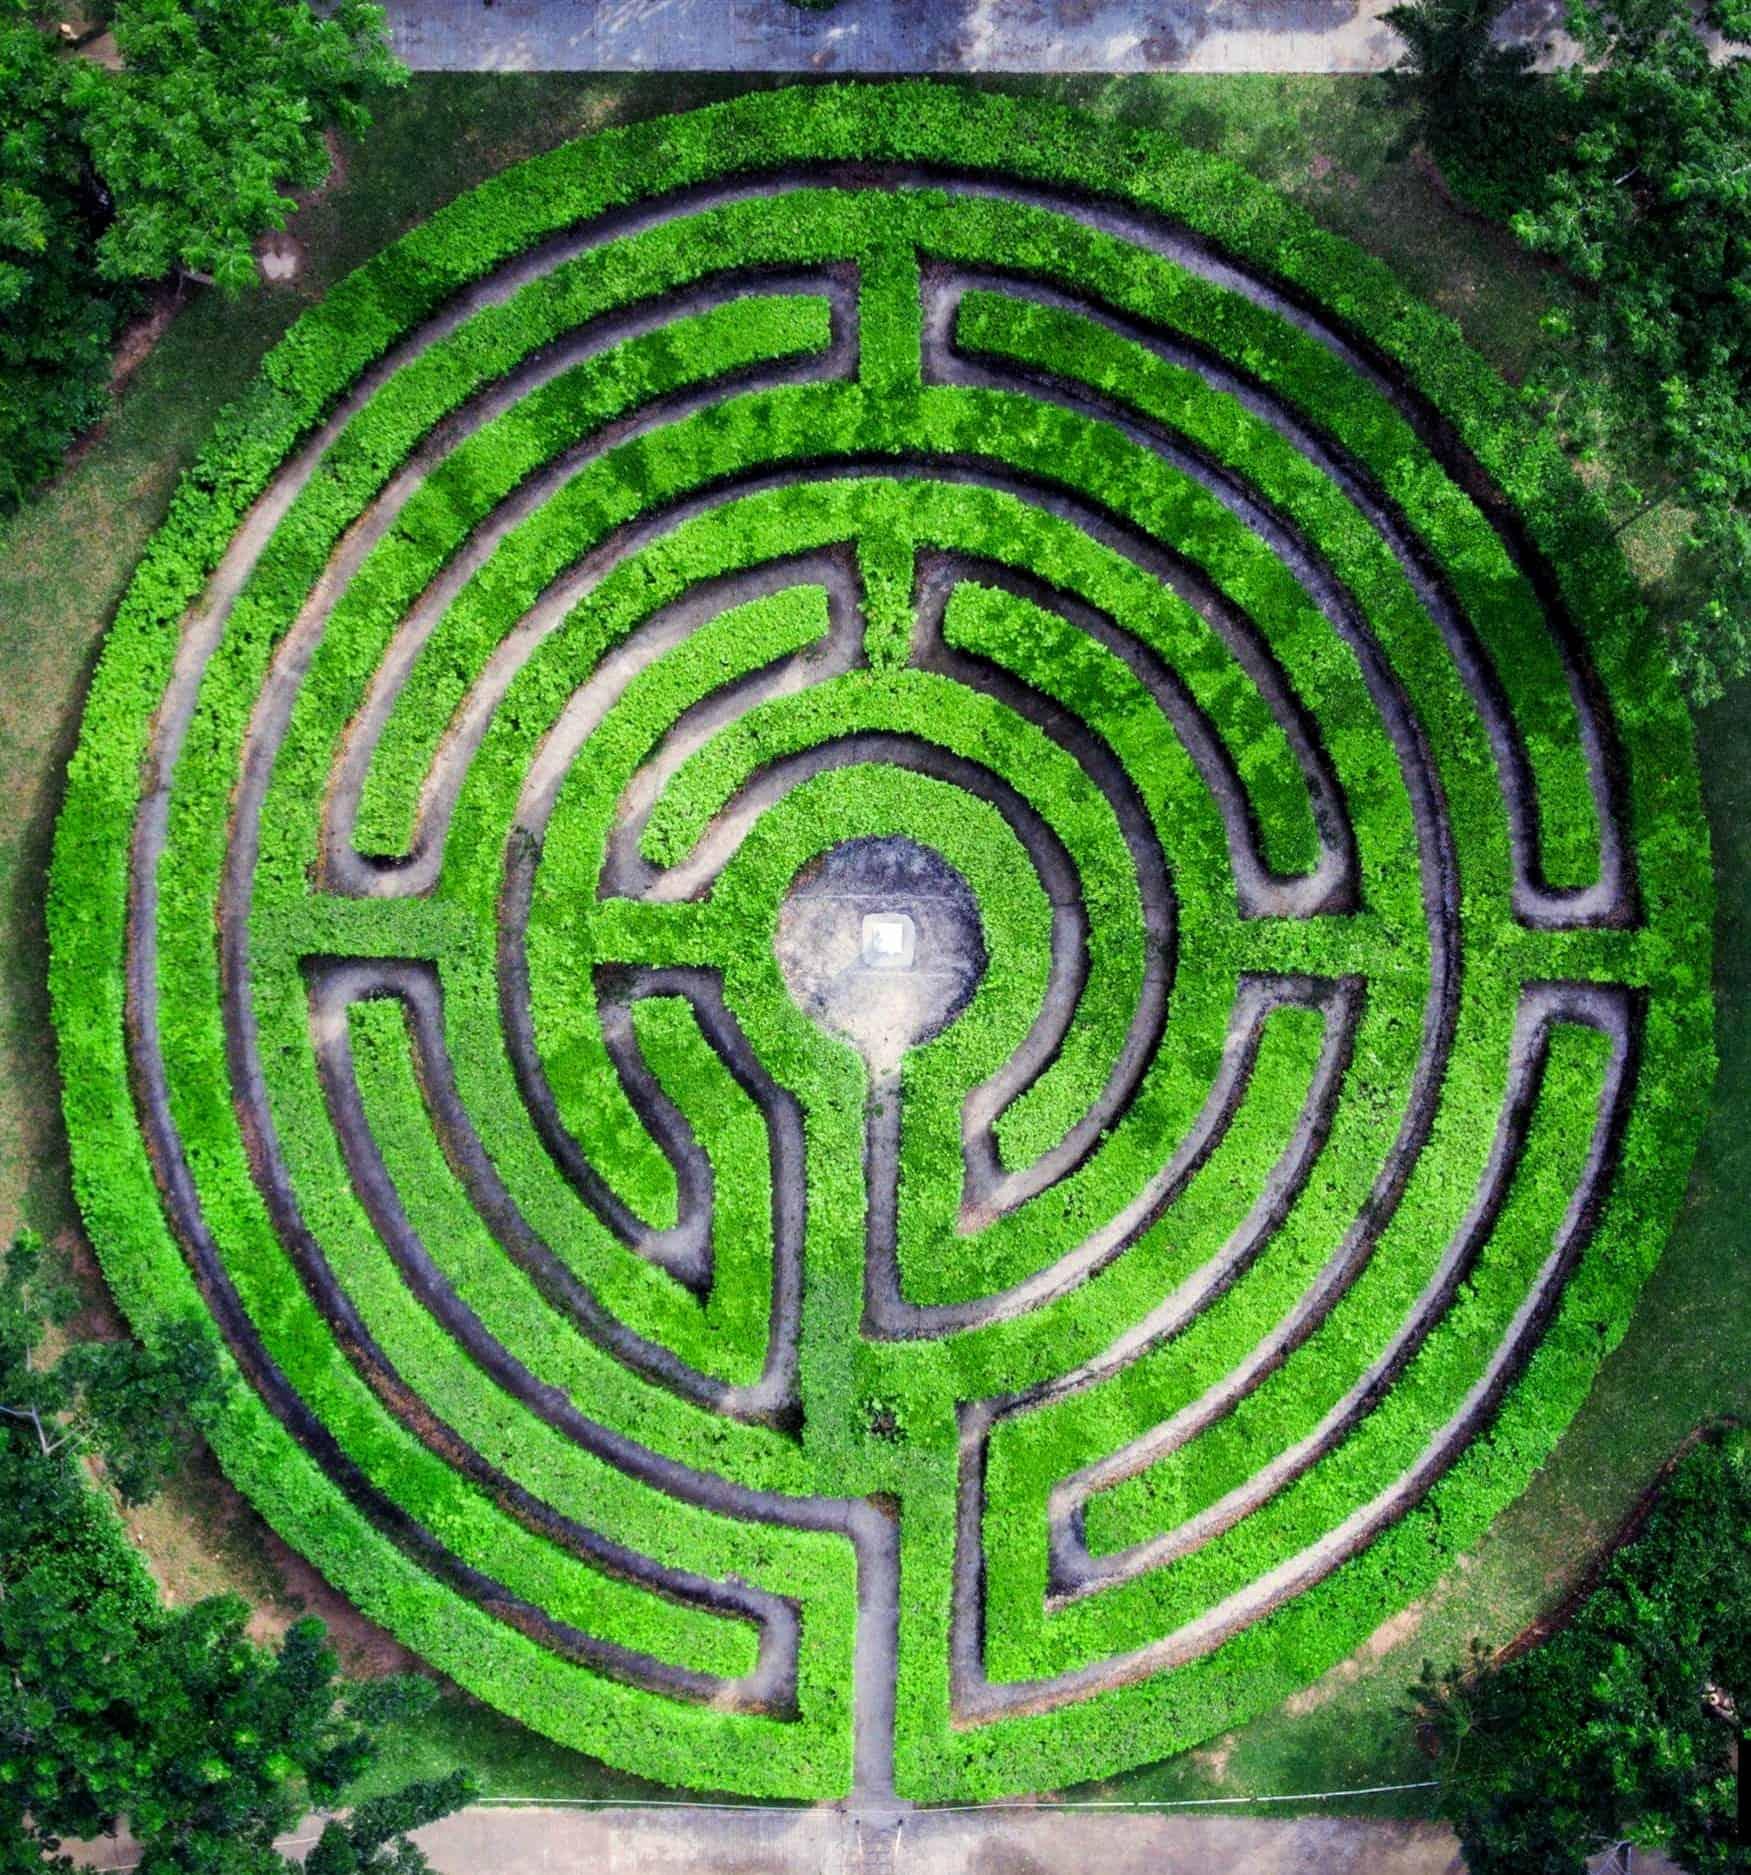 labyrinth-mazegarden-toledocebu2